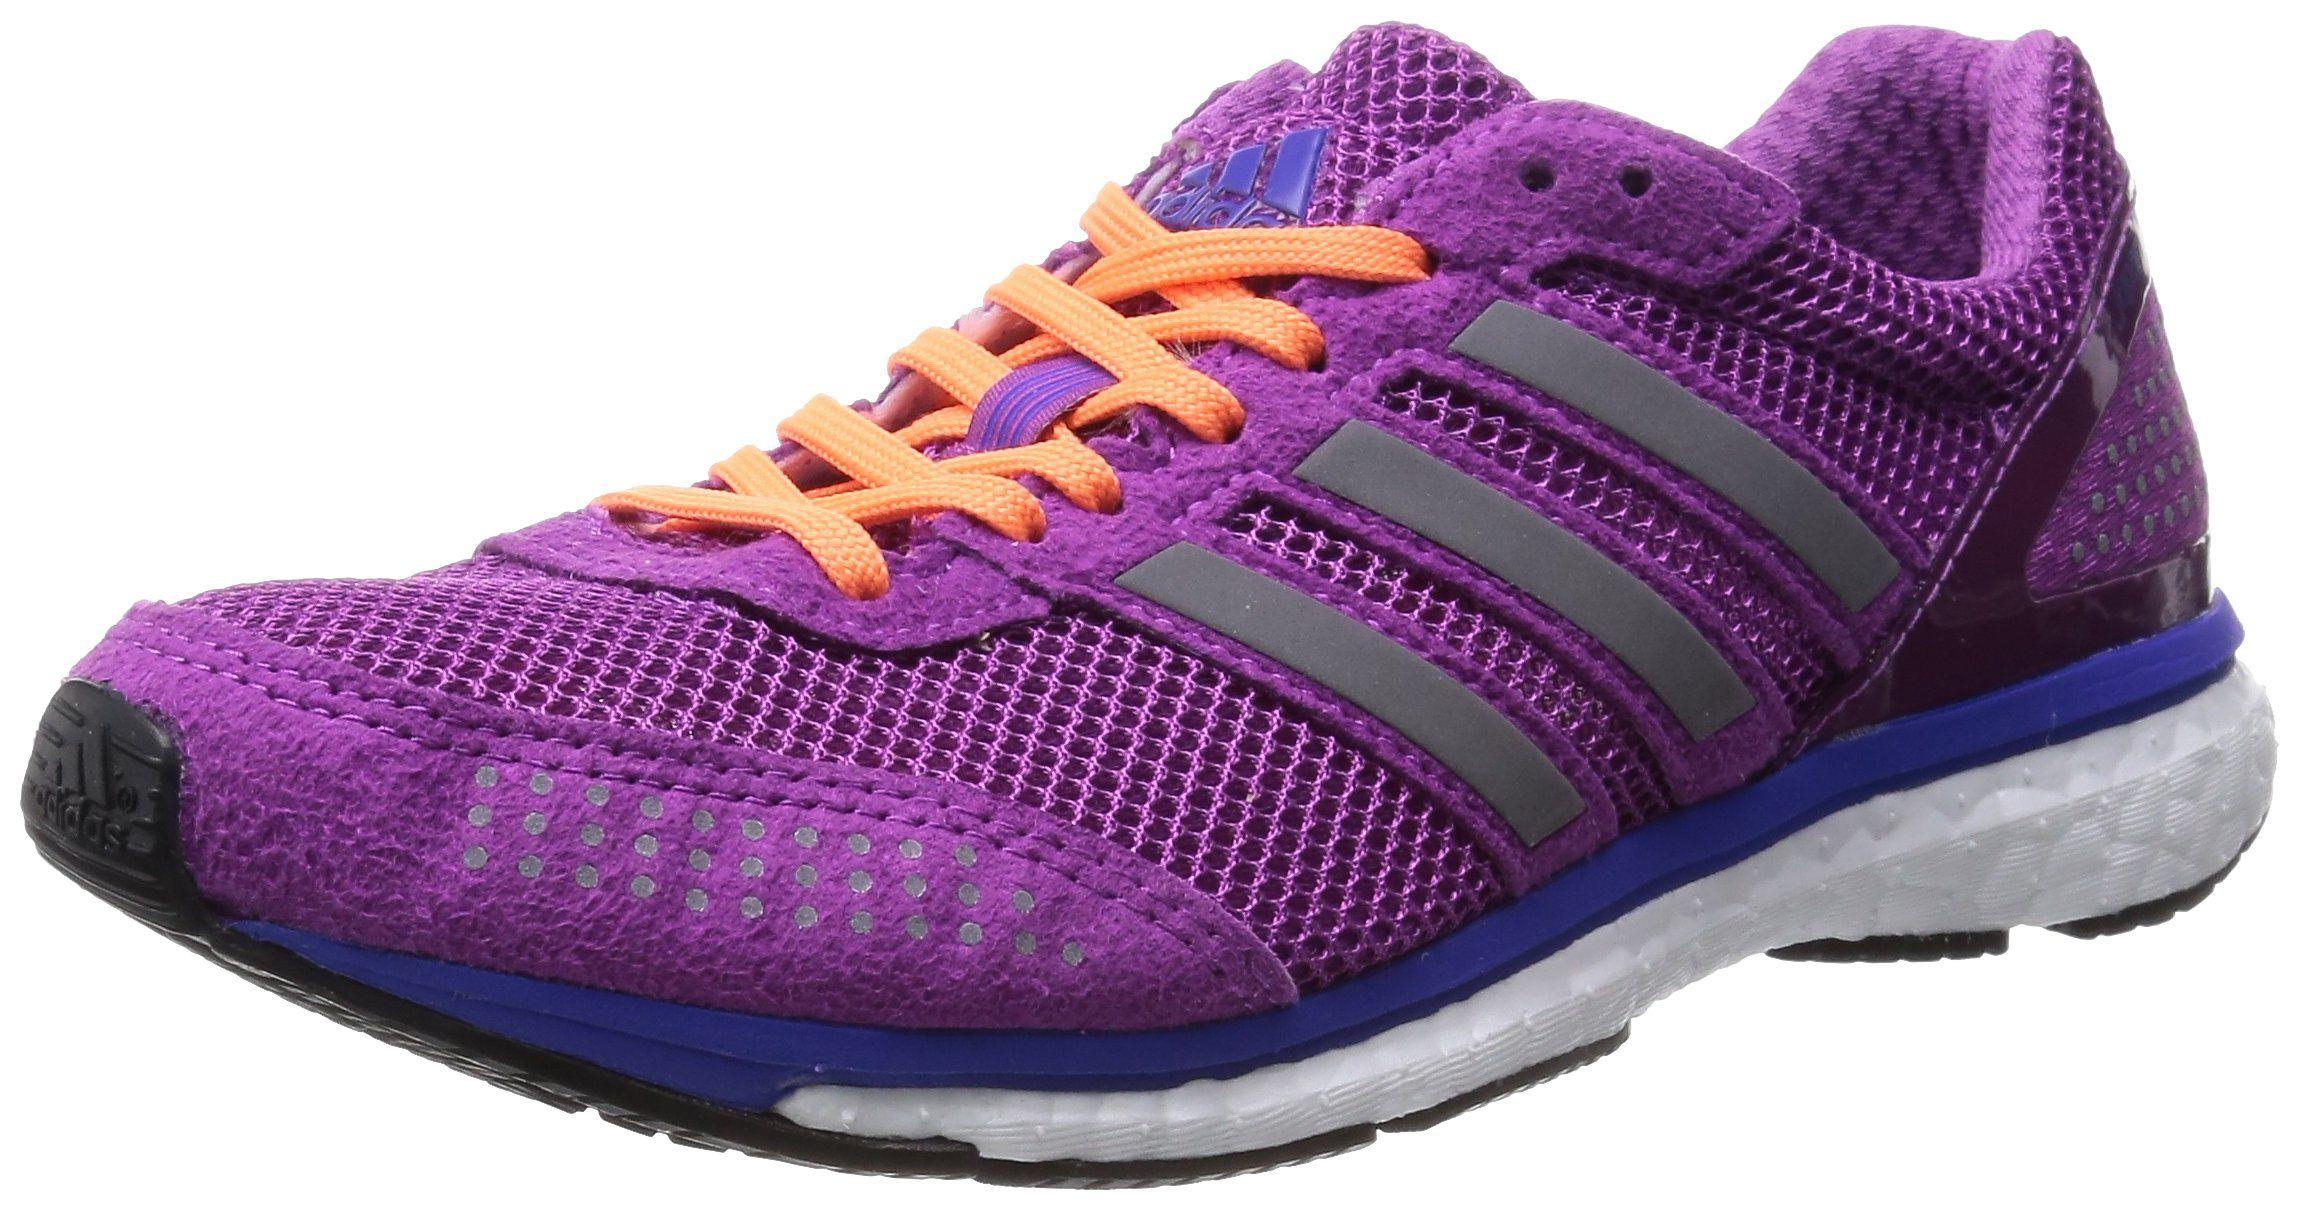 Adidas Adizero Adios Boost 2 Women's Running Shoes - SS15 ...